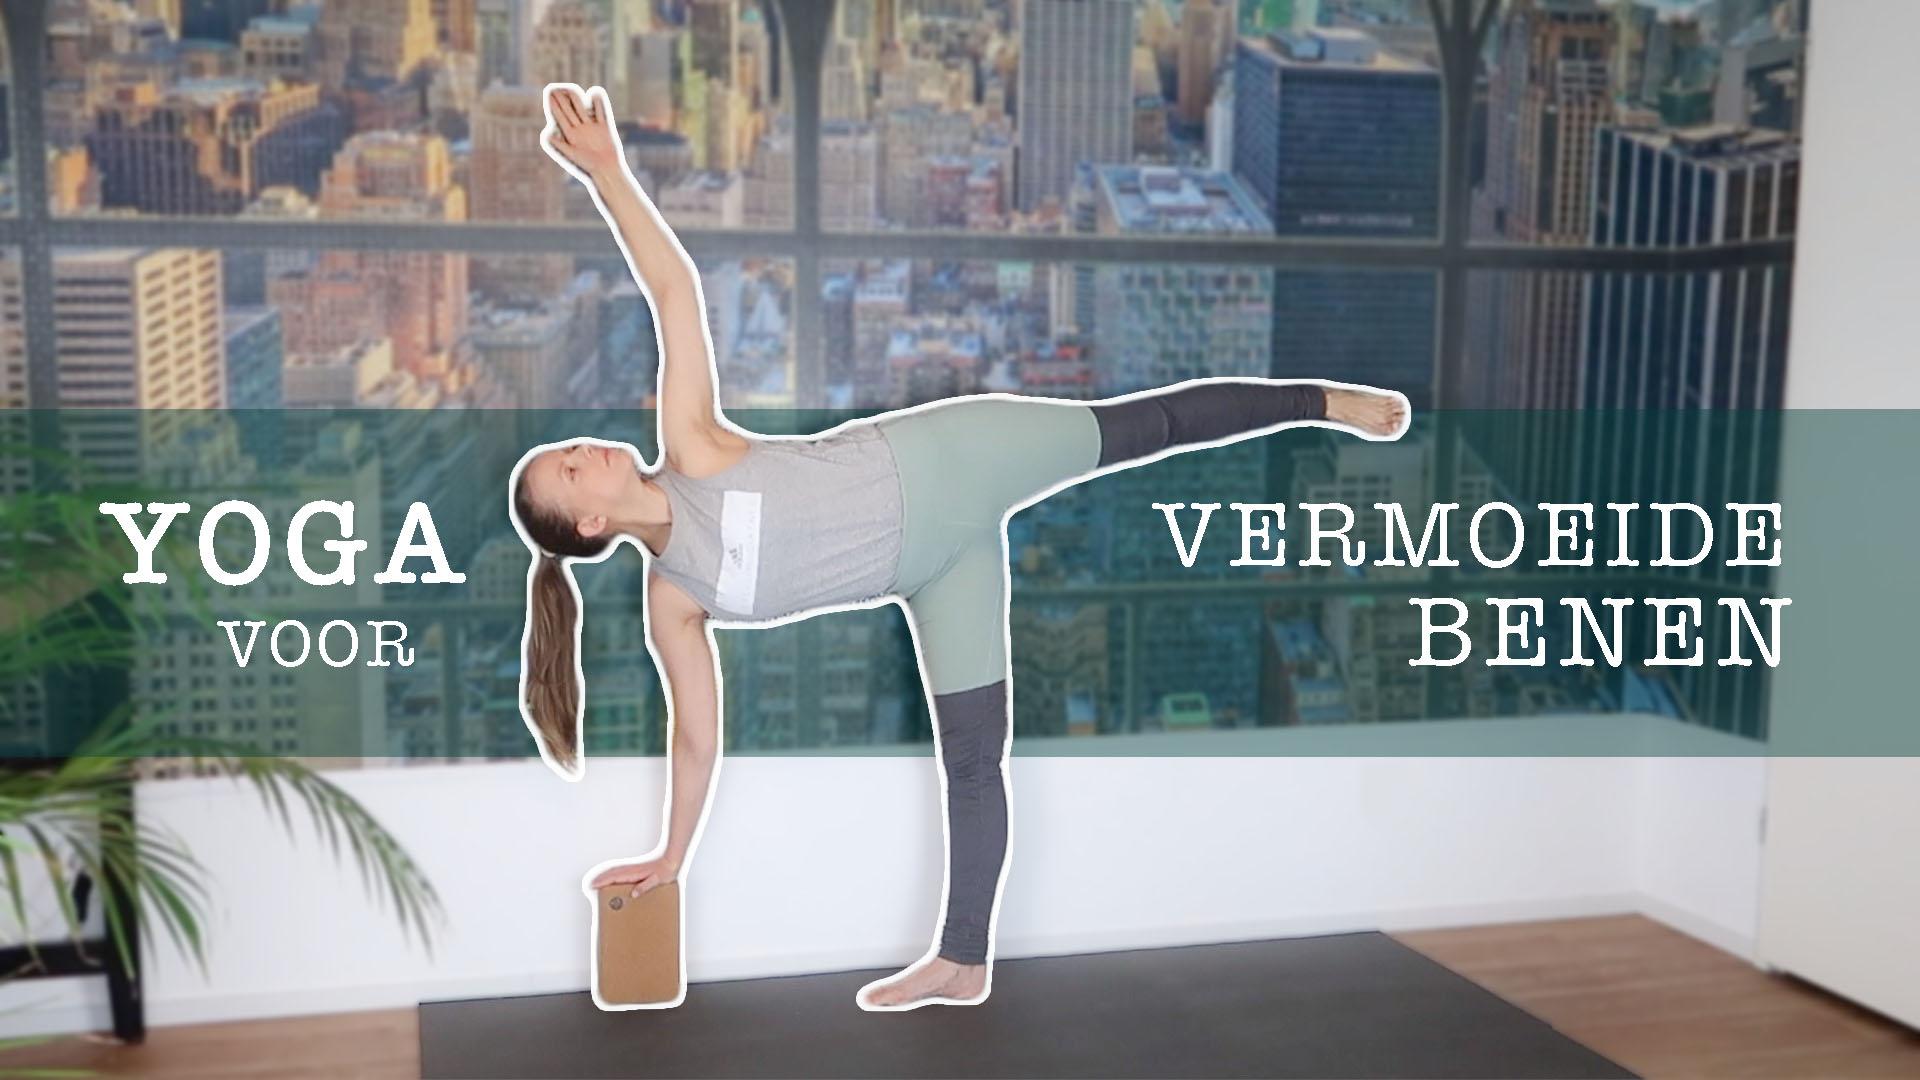 yogales vermoeide benen